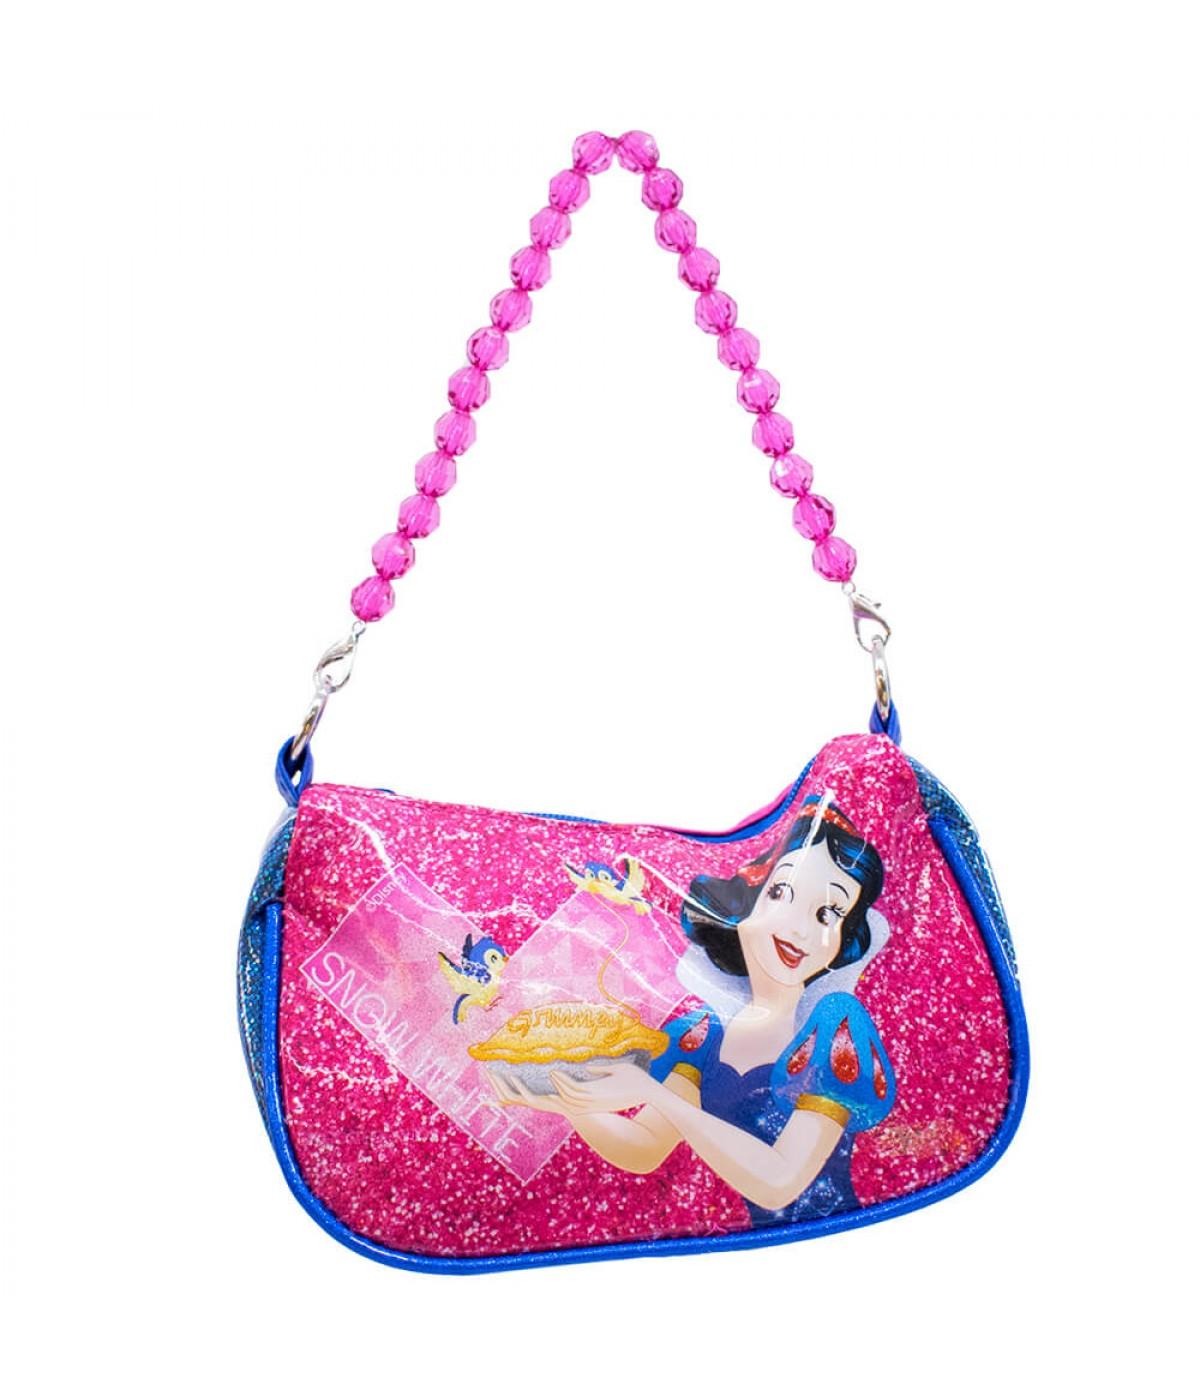 fa68997a7 Bolsa Azul Princesa Branca De Neve Com Alça De Miçanga - Disney ...